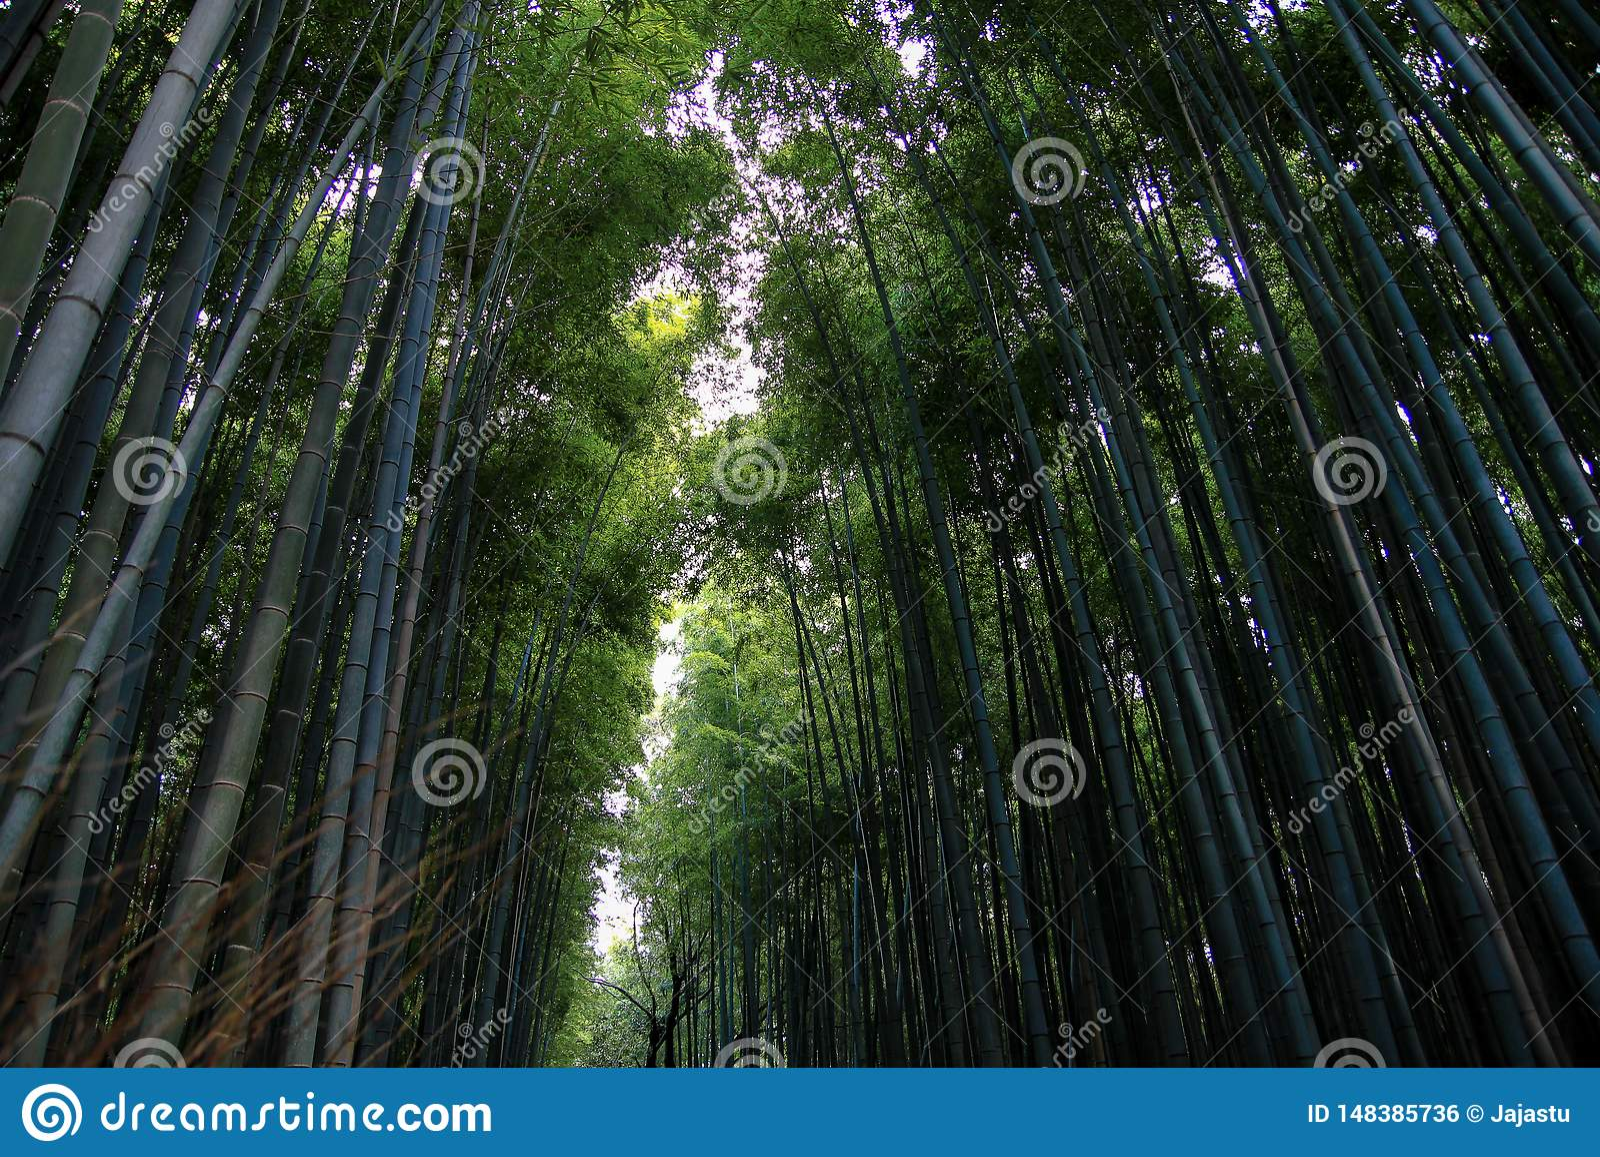 Arboleda de bamb? famosa de Arashiyama, Jap?n